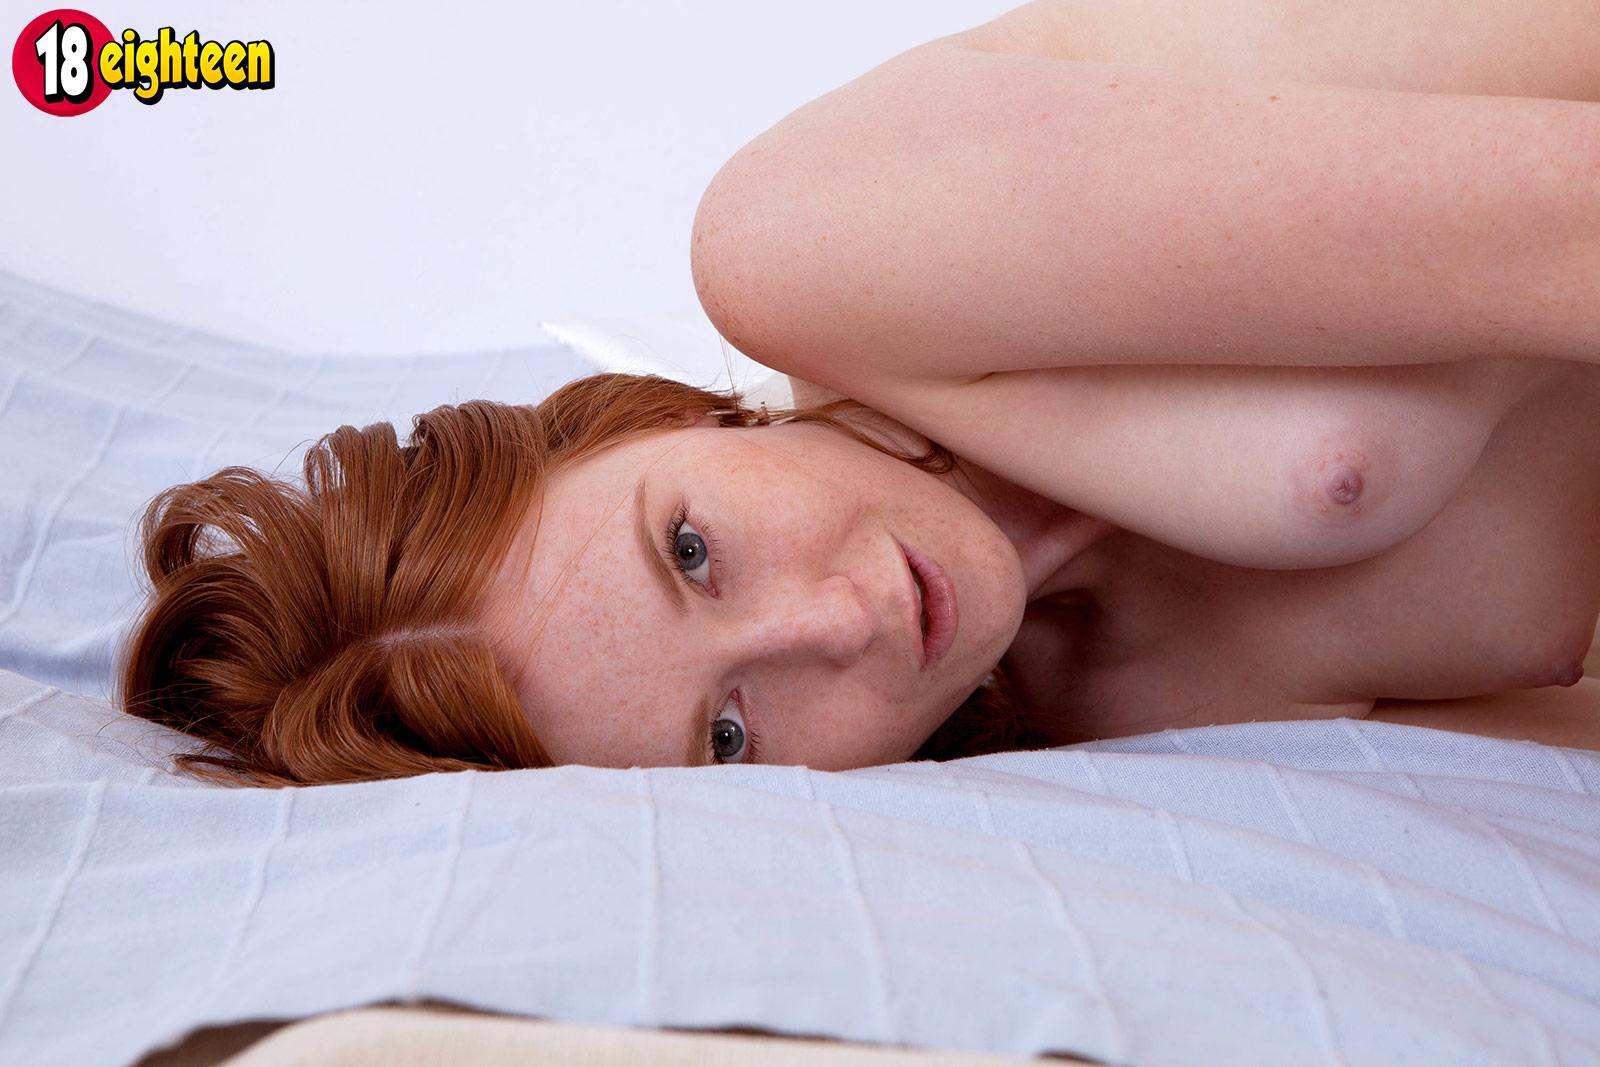 Dede recommends Honeymoon night blowjob video